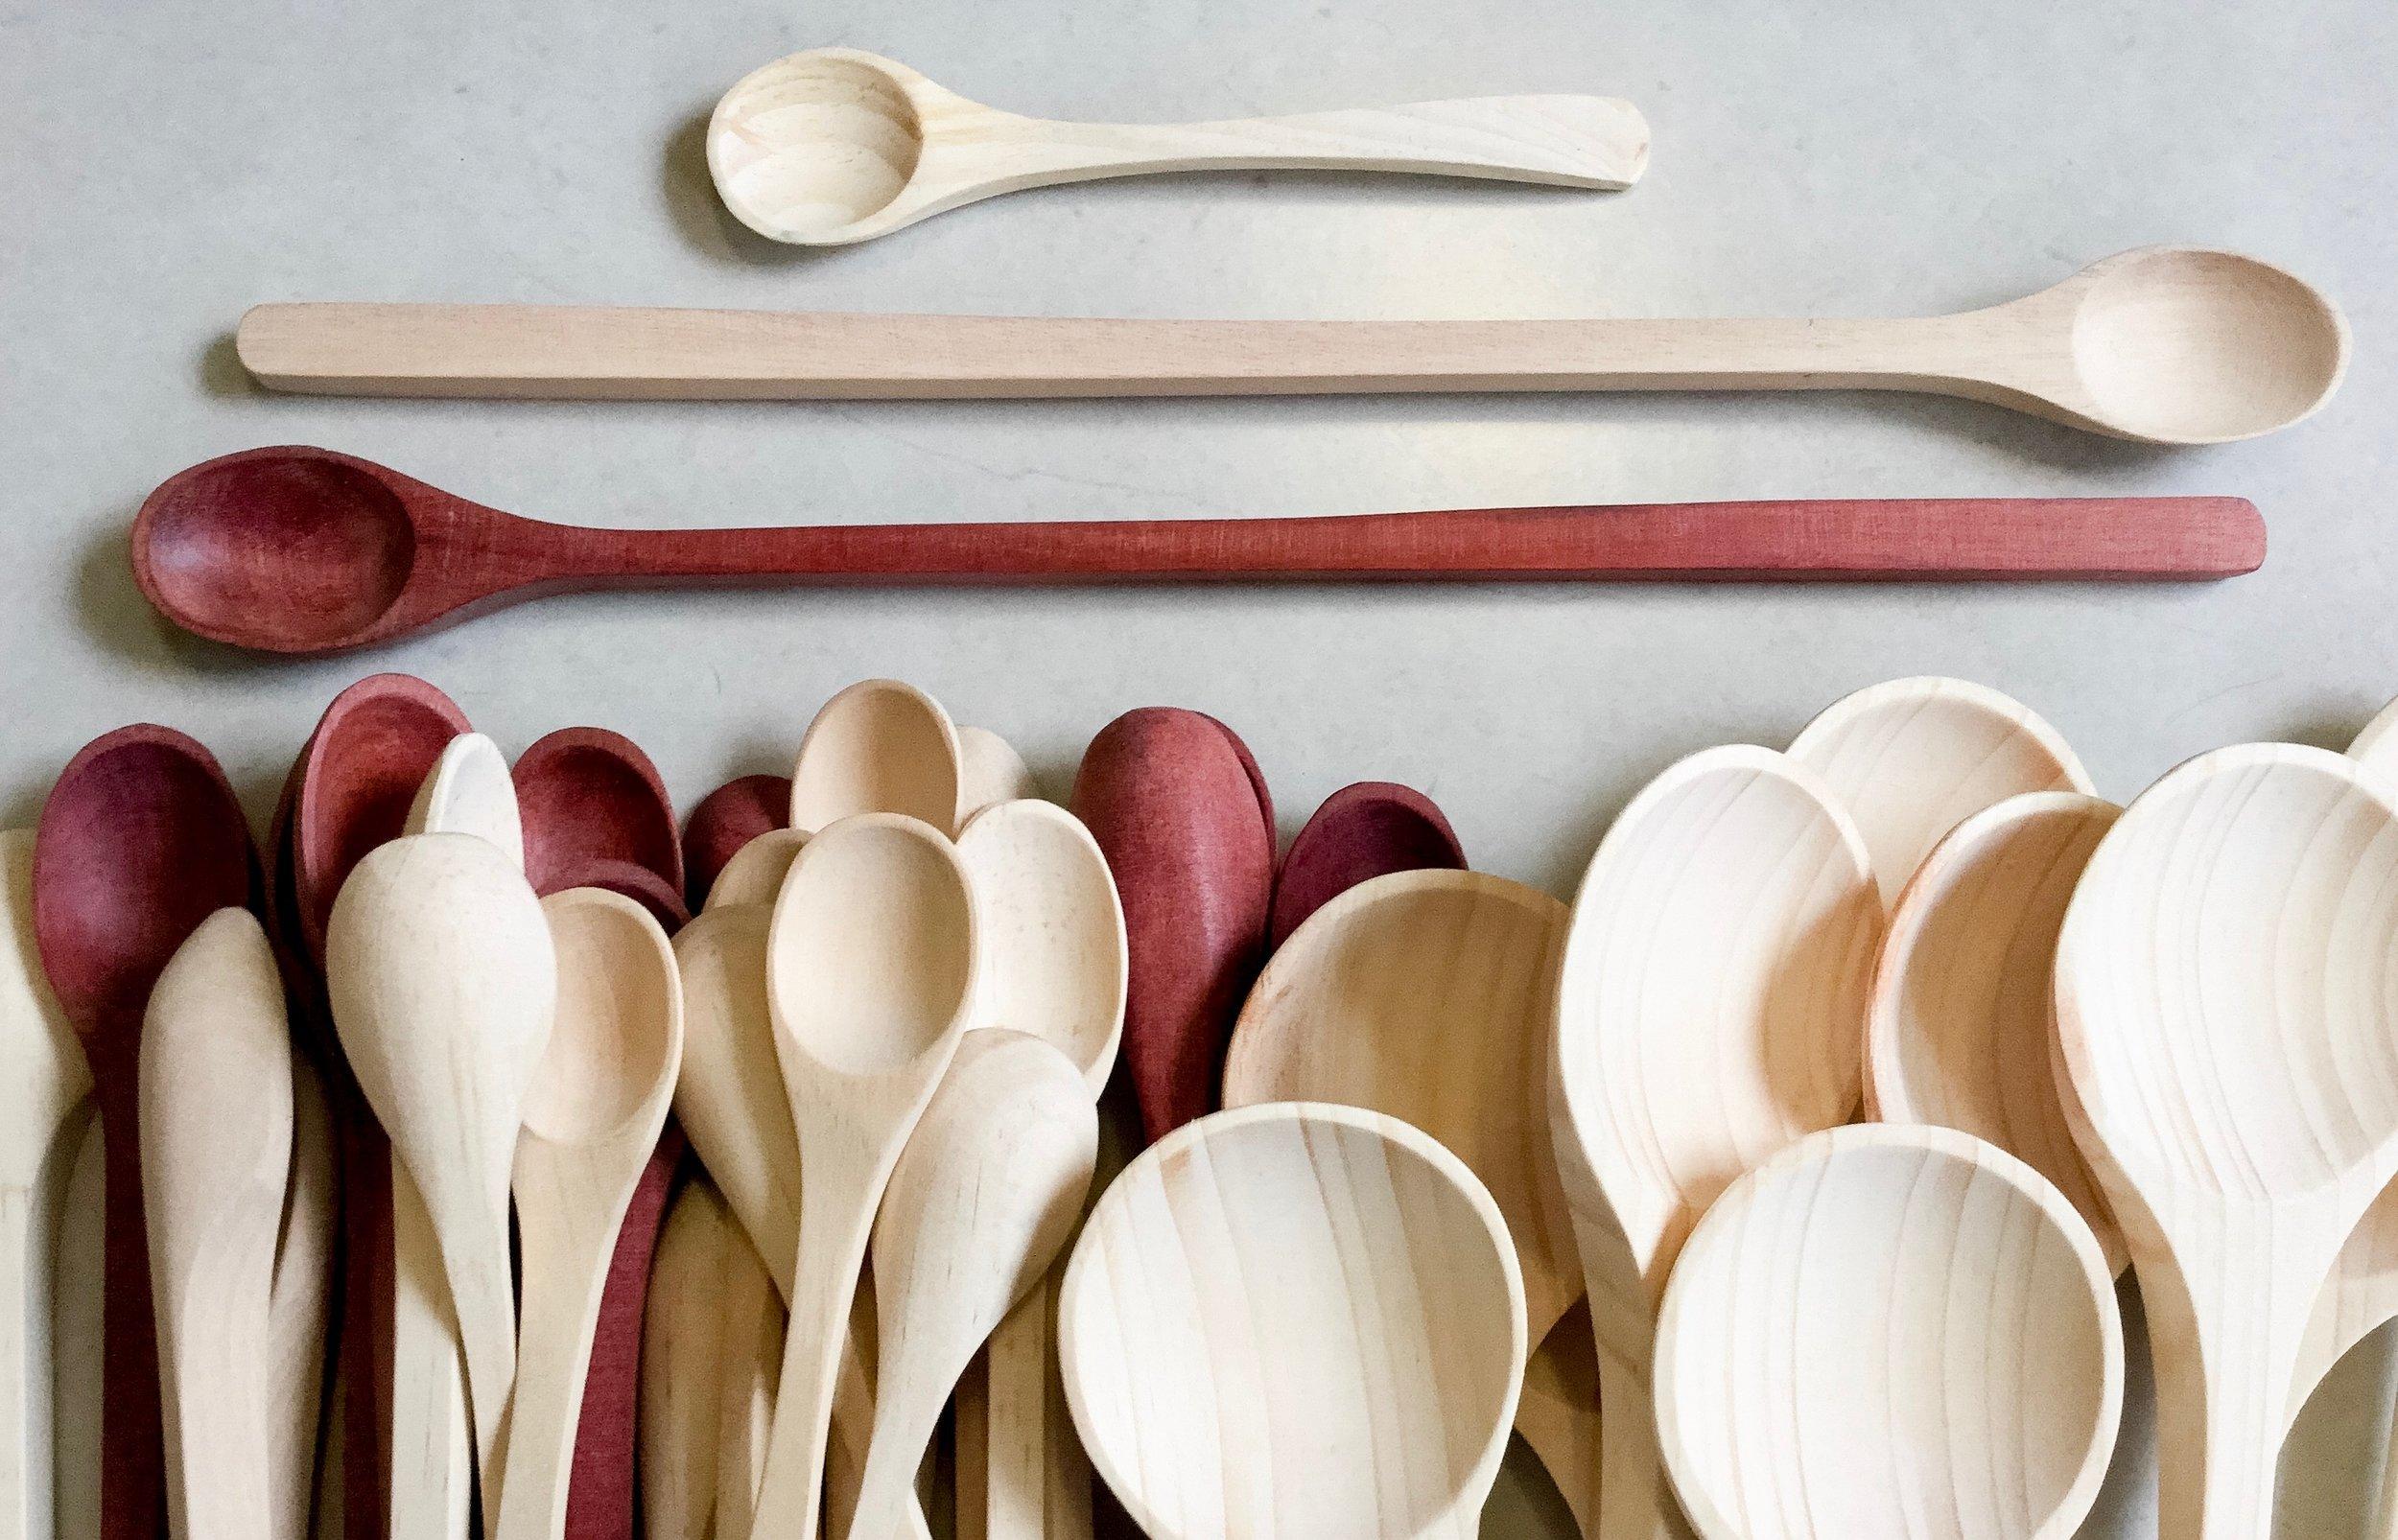 Nazareno spoons